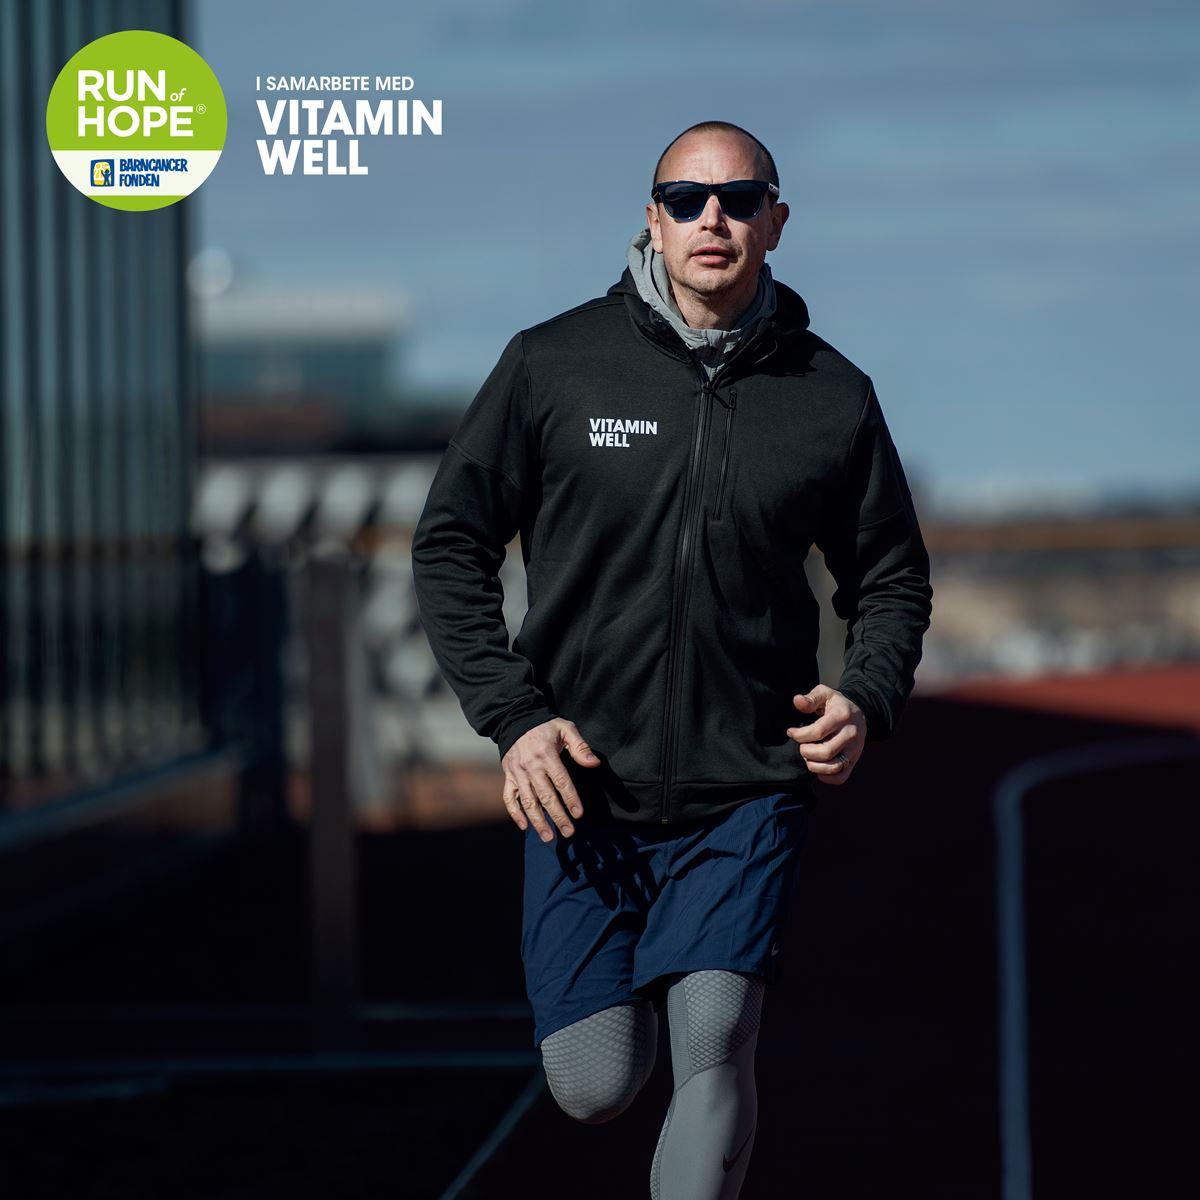 Run of Hope - Vitamin Well & Petter